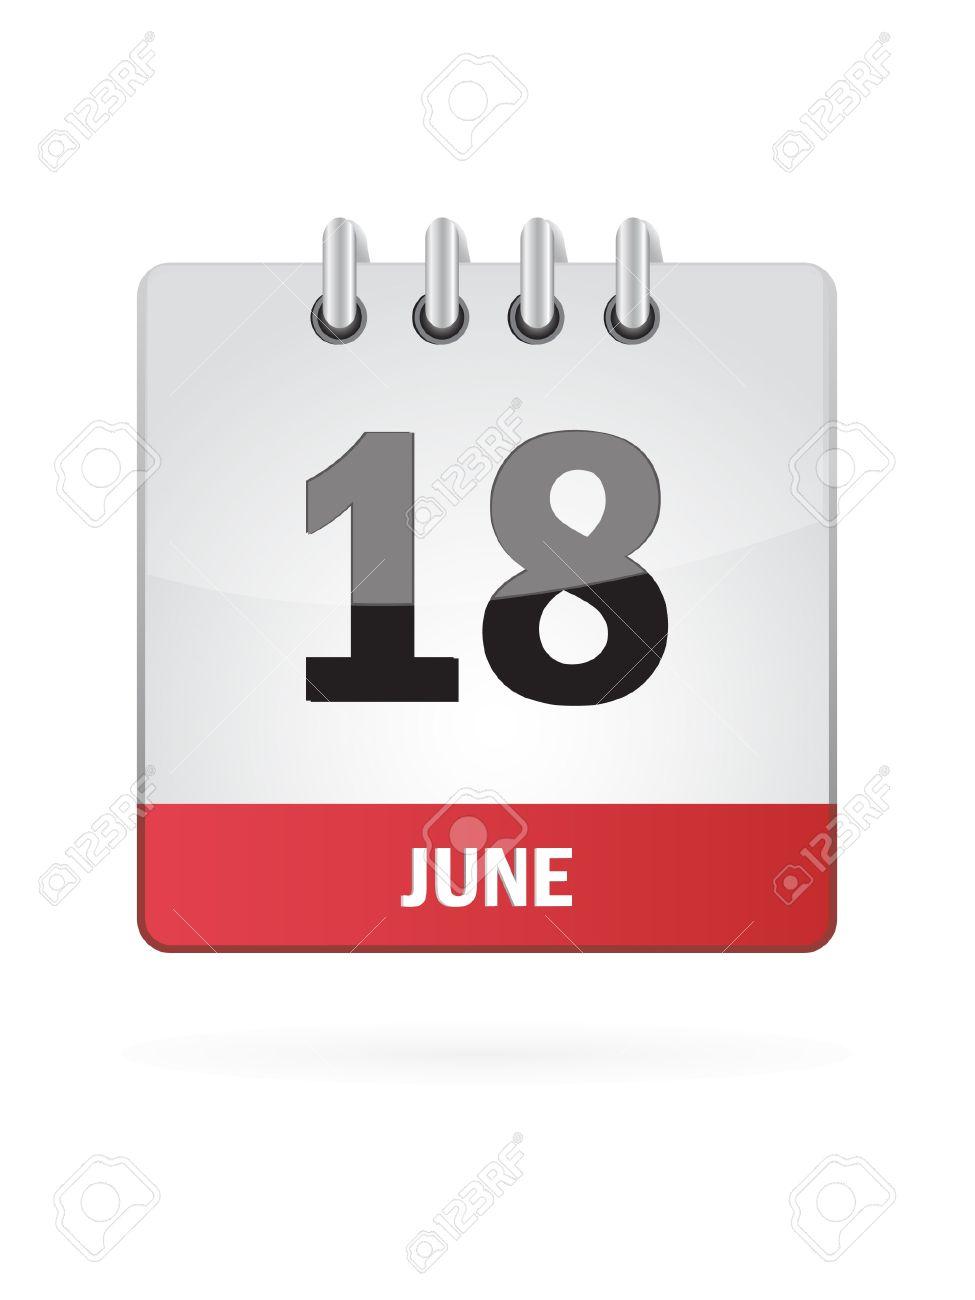 18 June Calendar Icon On White Background Stock Vector - 18457024